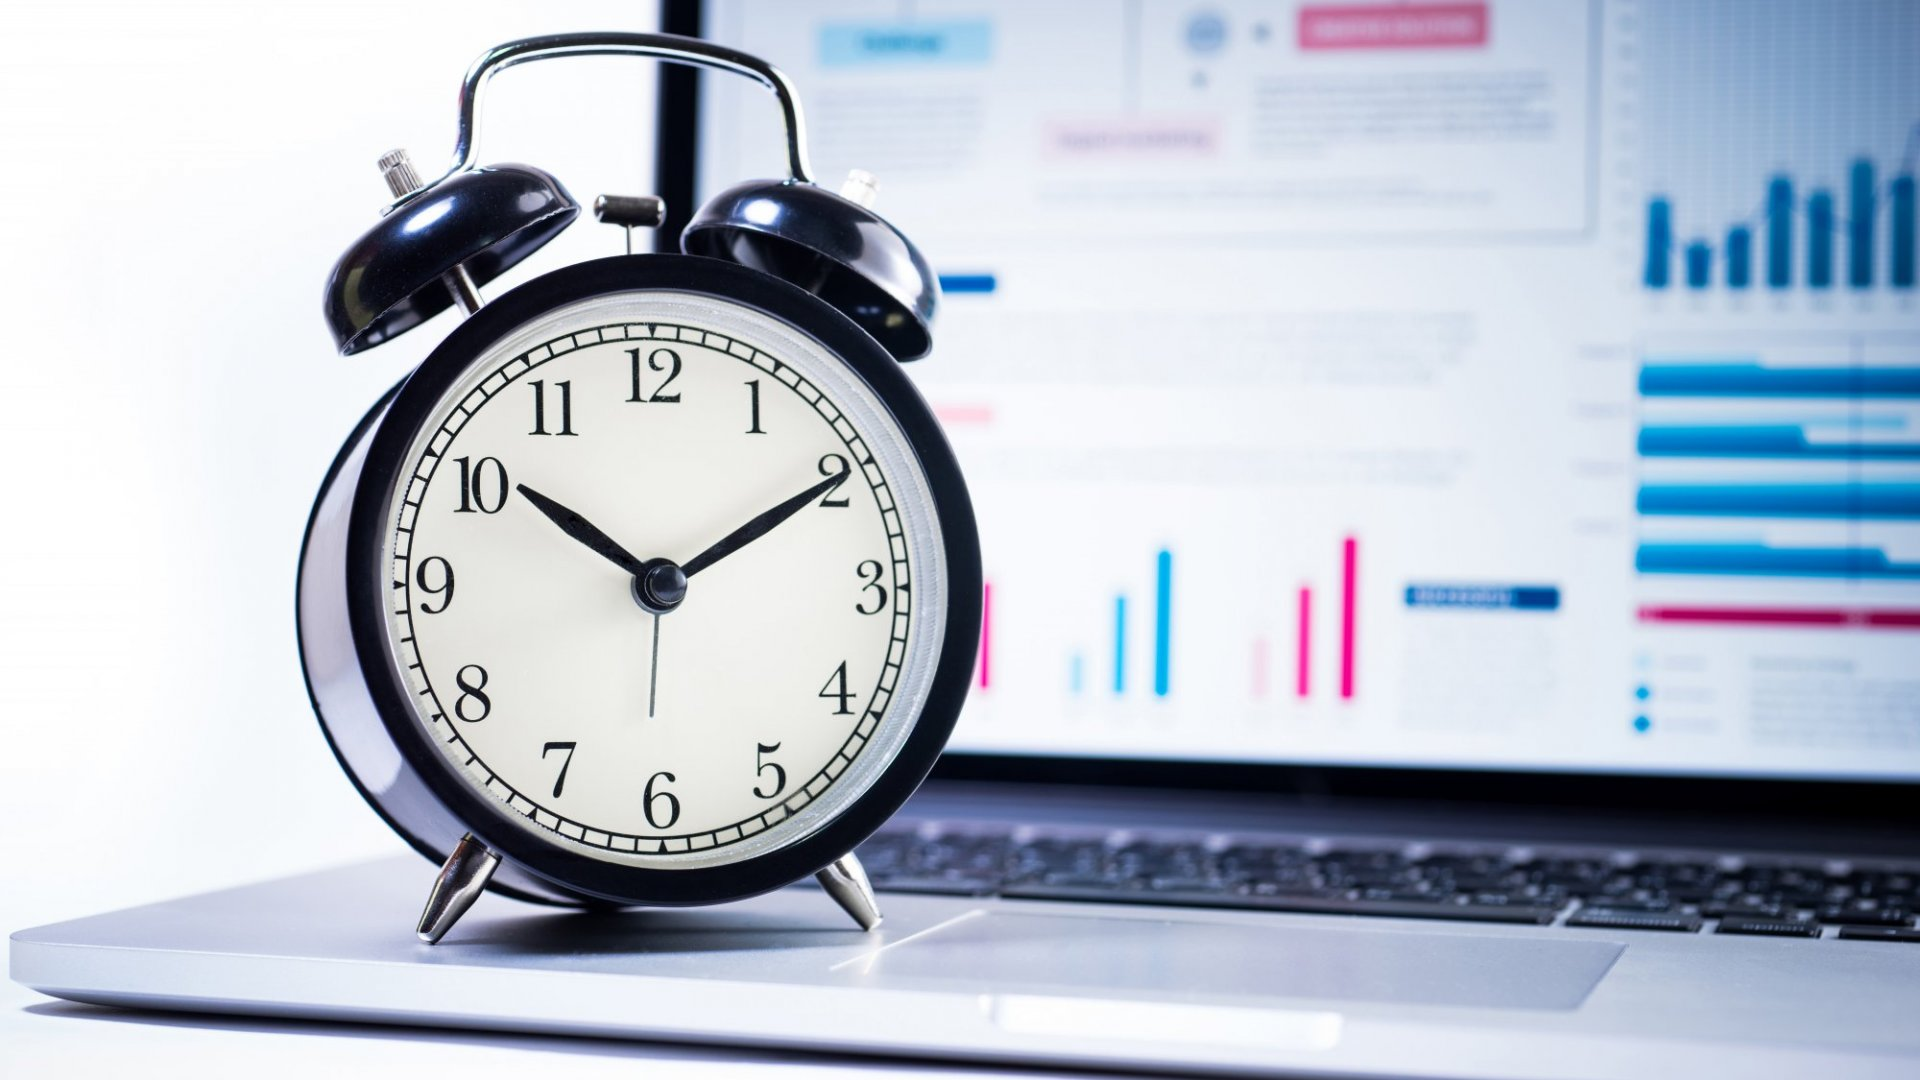 10 Time-Saving Strategies According to a Top Wall Street Performance Coach  | Inc.com